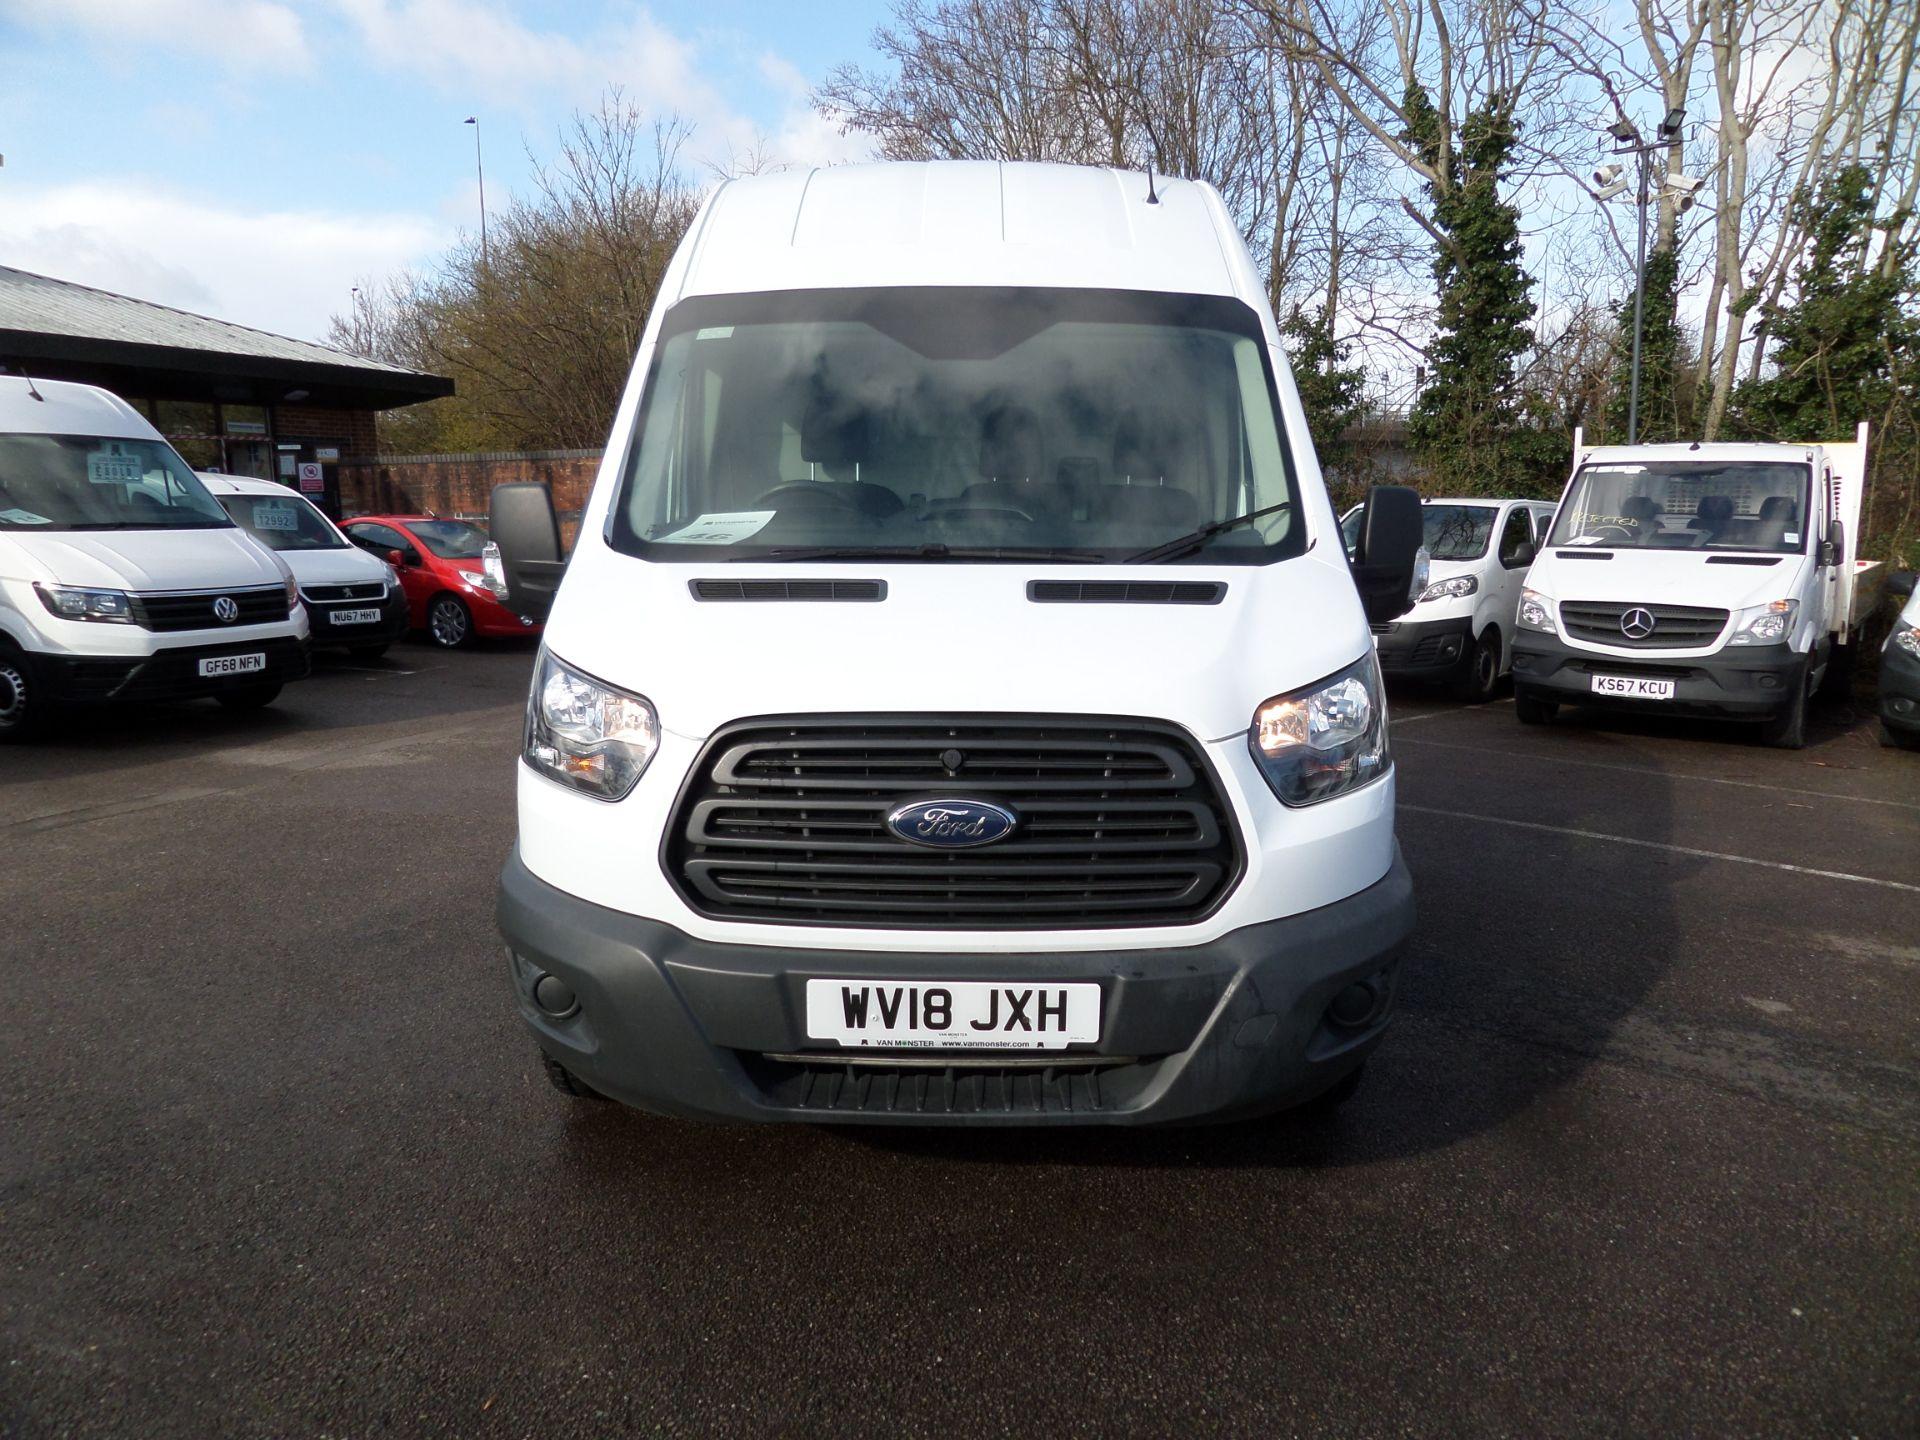 2018 Ford Transit 2.0 Tdci 130Ps H3 Van Euro 6 (WV18JXH) Image 10